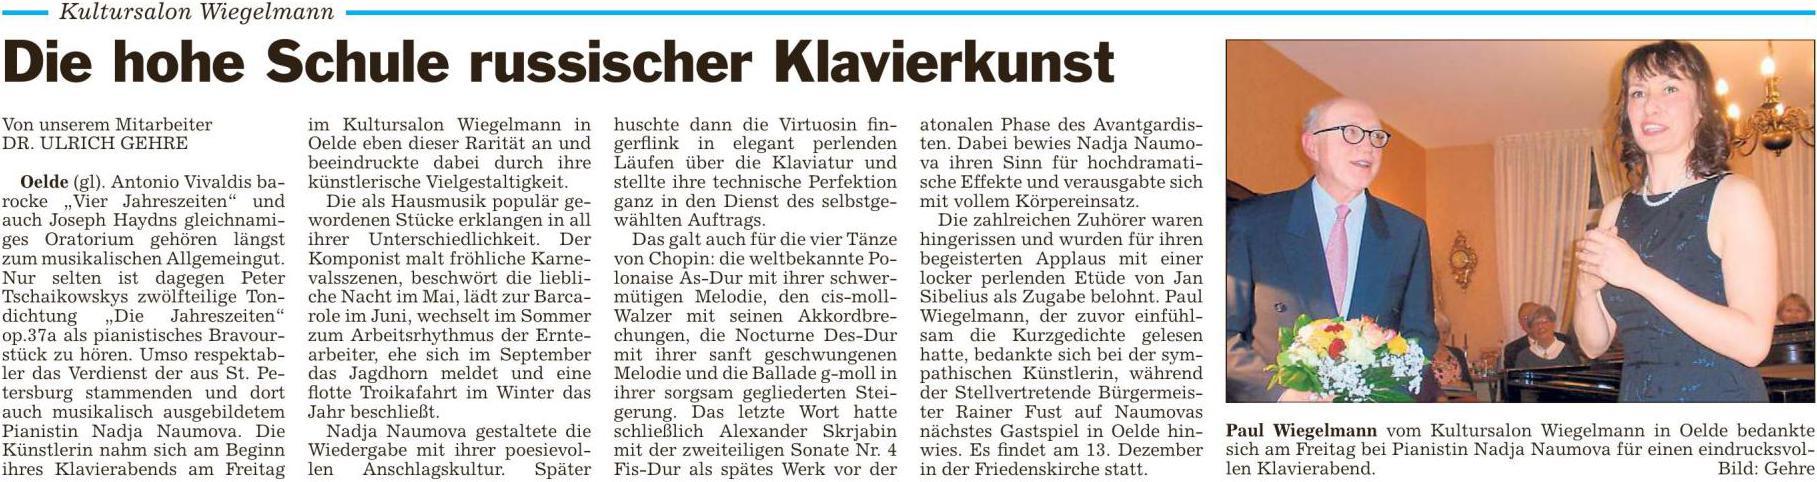 Pressebericht Nadja Naumova 16.10.2015